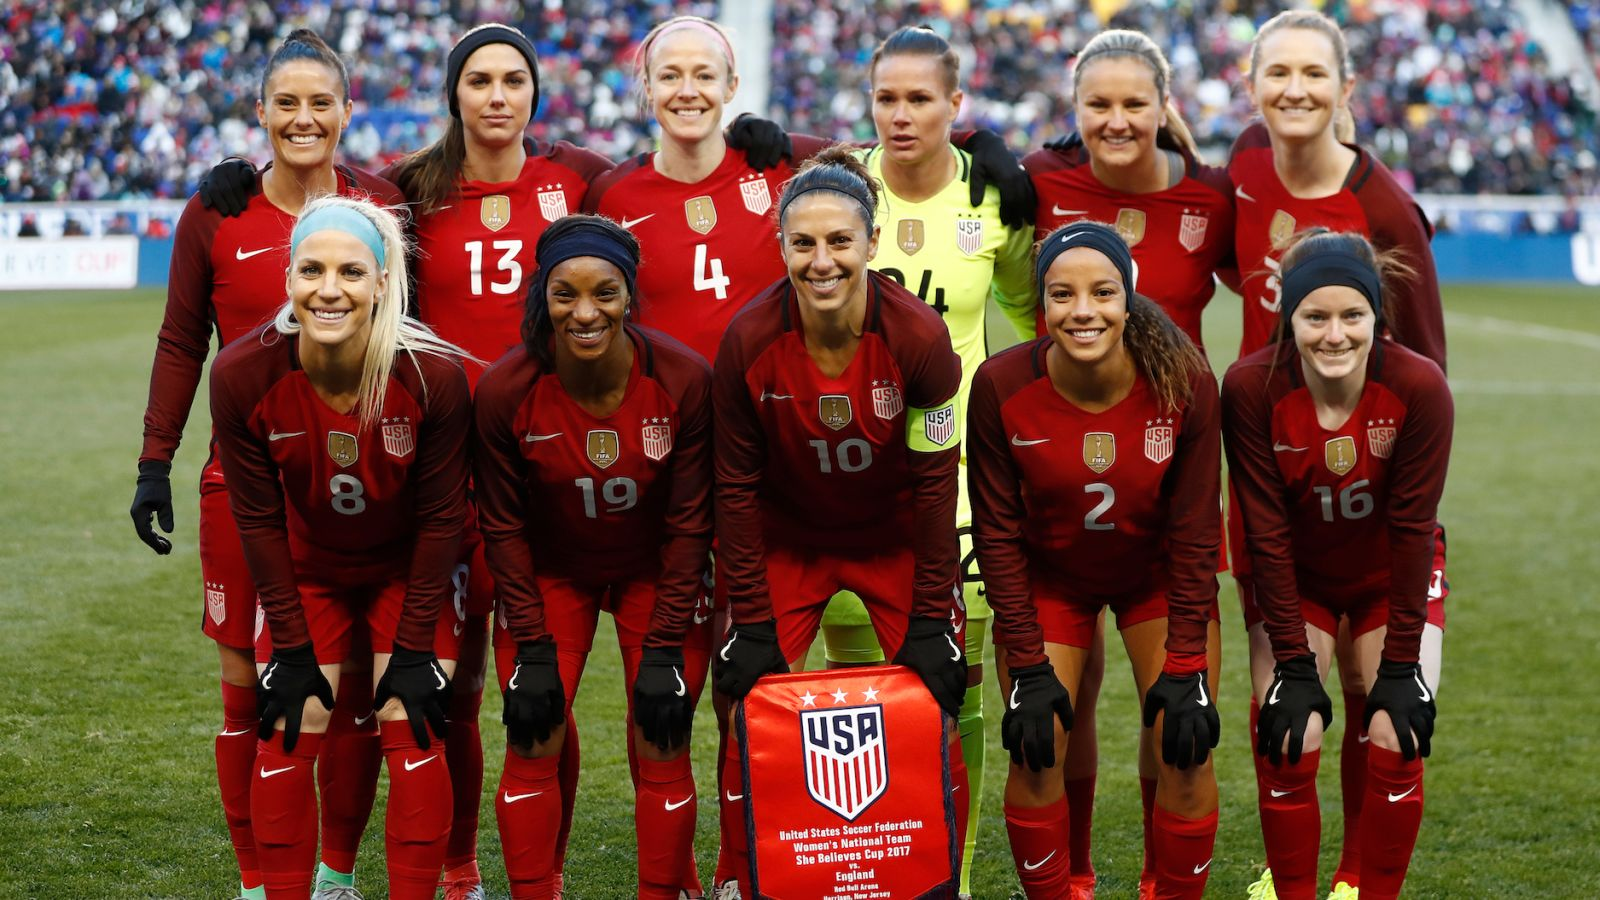 United States Soccer Federation Wallpaper 16   1600 X 900 stmednet 1600x900